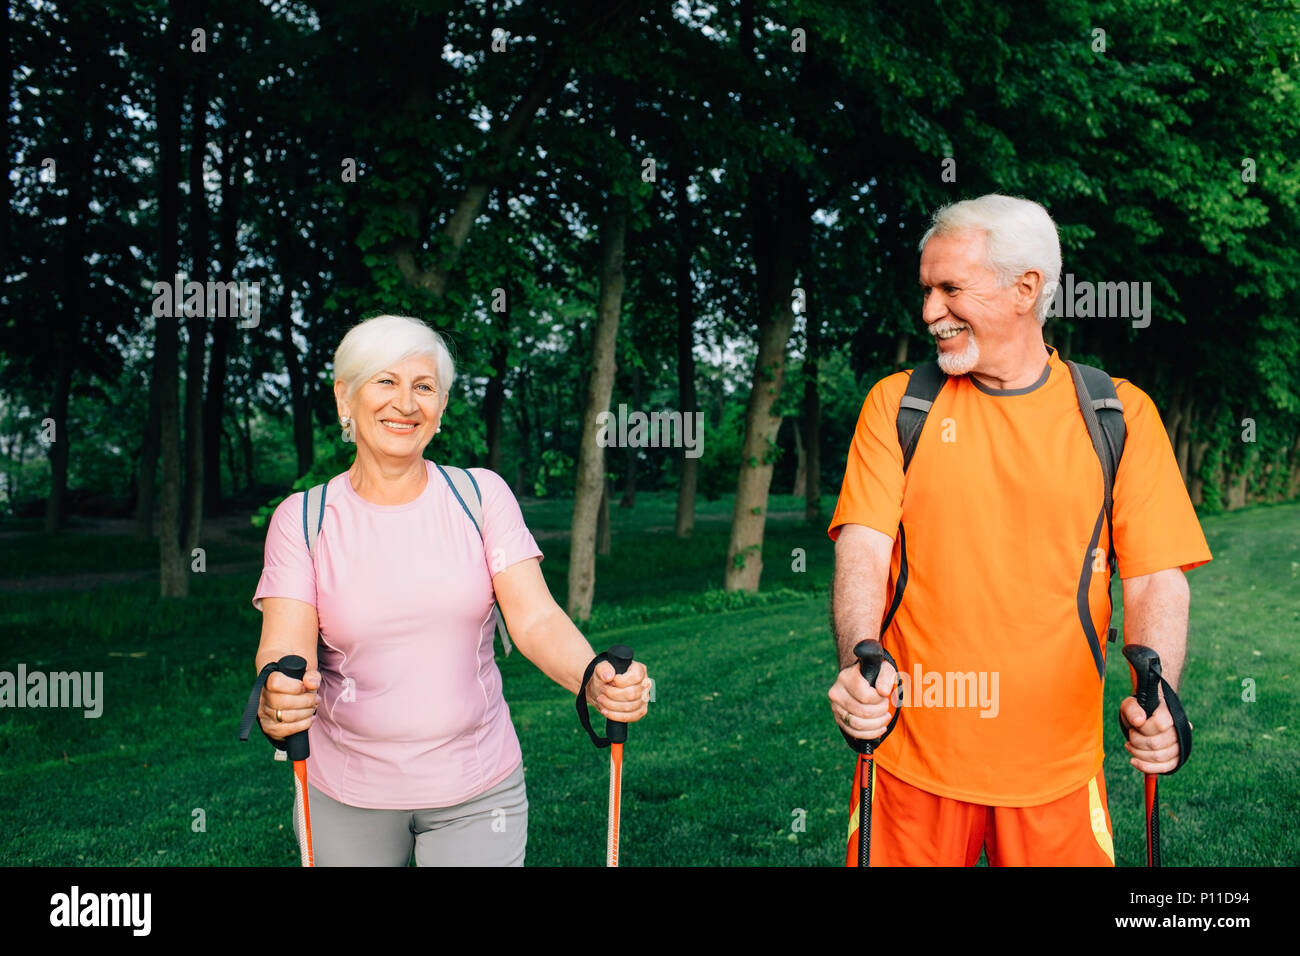 Seniors, hiking and active lifestyles - Stock Image